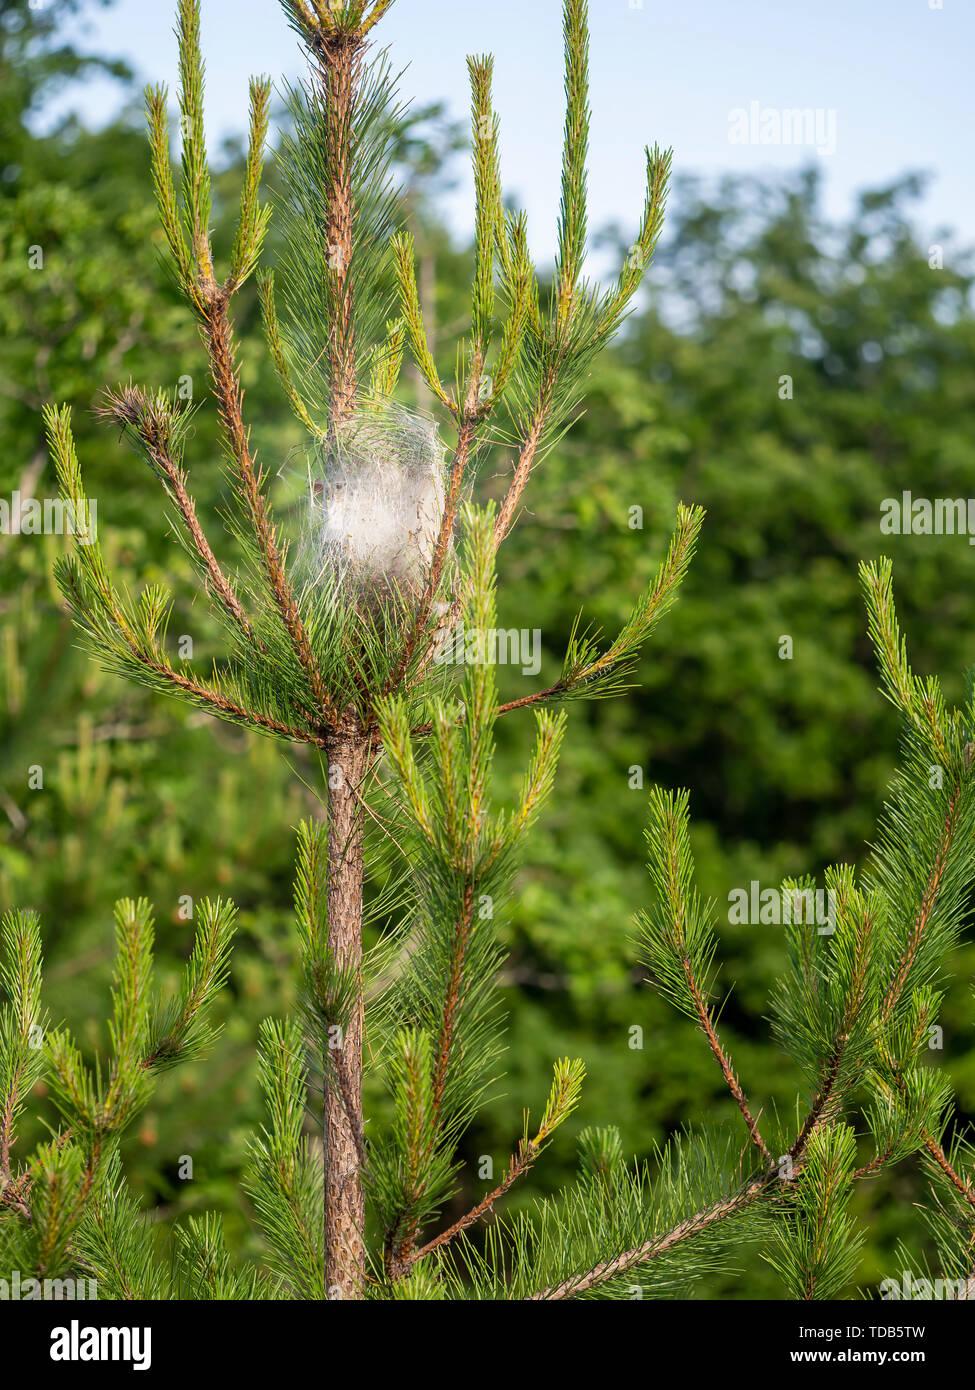 Pine processionary moth caterpillar nest. Thaumetopoea pityocampa. Destructive pest. - Stock Image